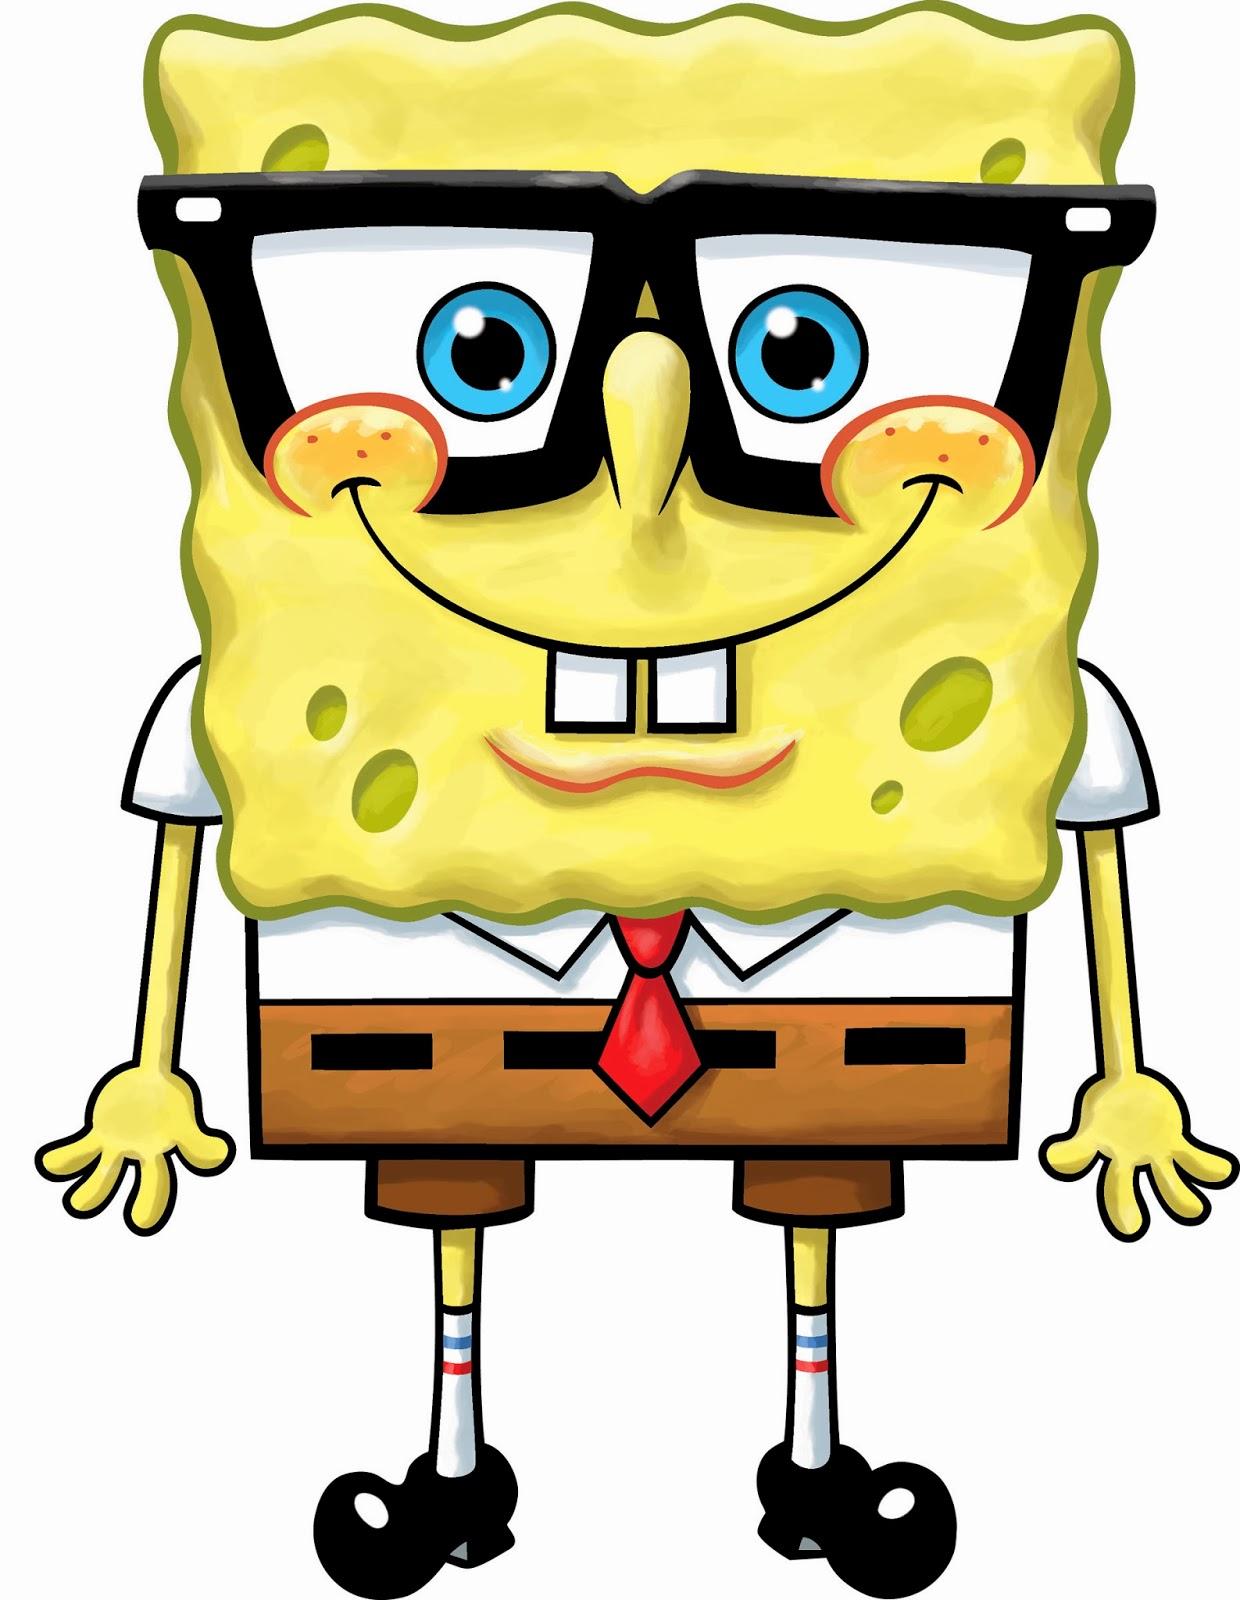 My Favorite Spongebob Squarepants' Episodes - Vifuckinsane